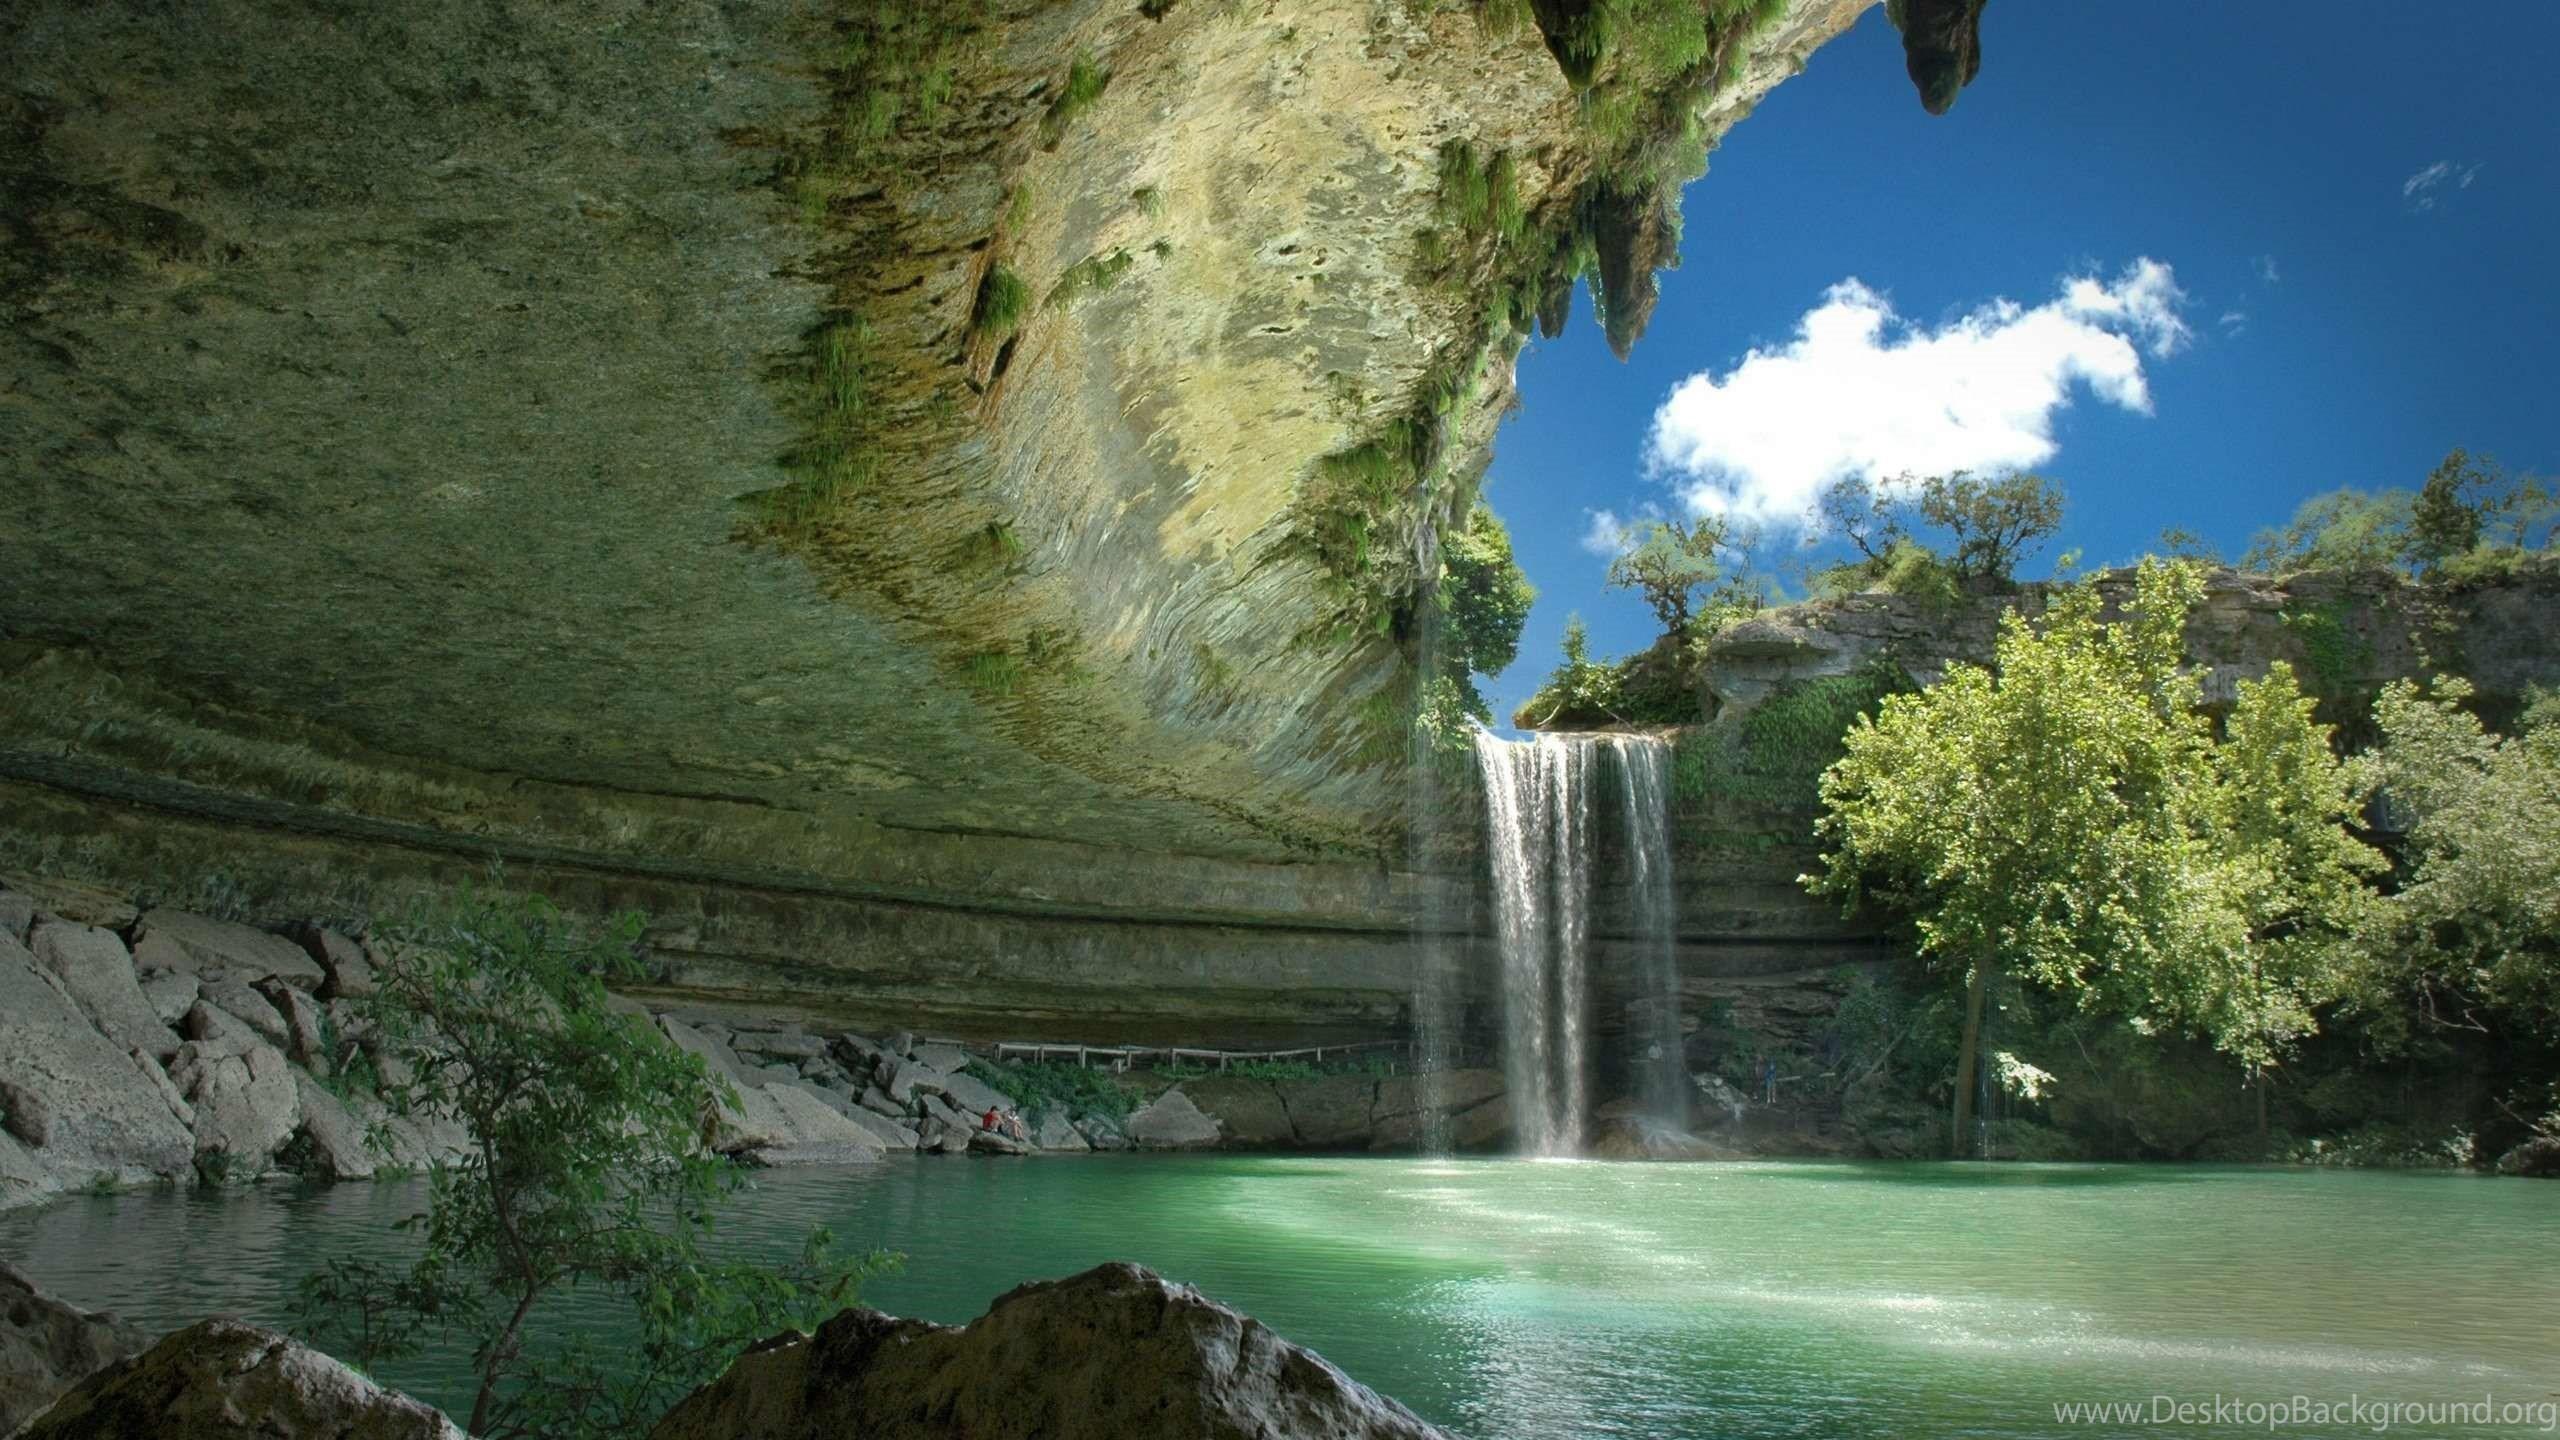 High resolution hd nature wallpapers widescreen desktop background netbook voltagebd Images